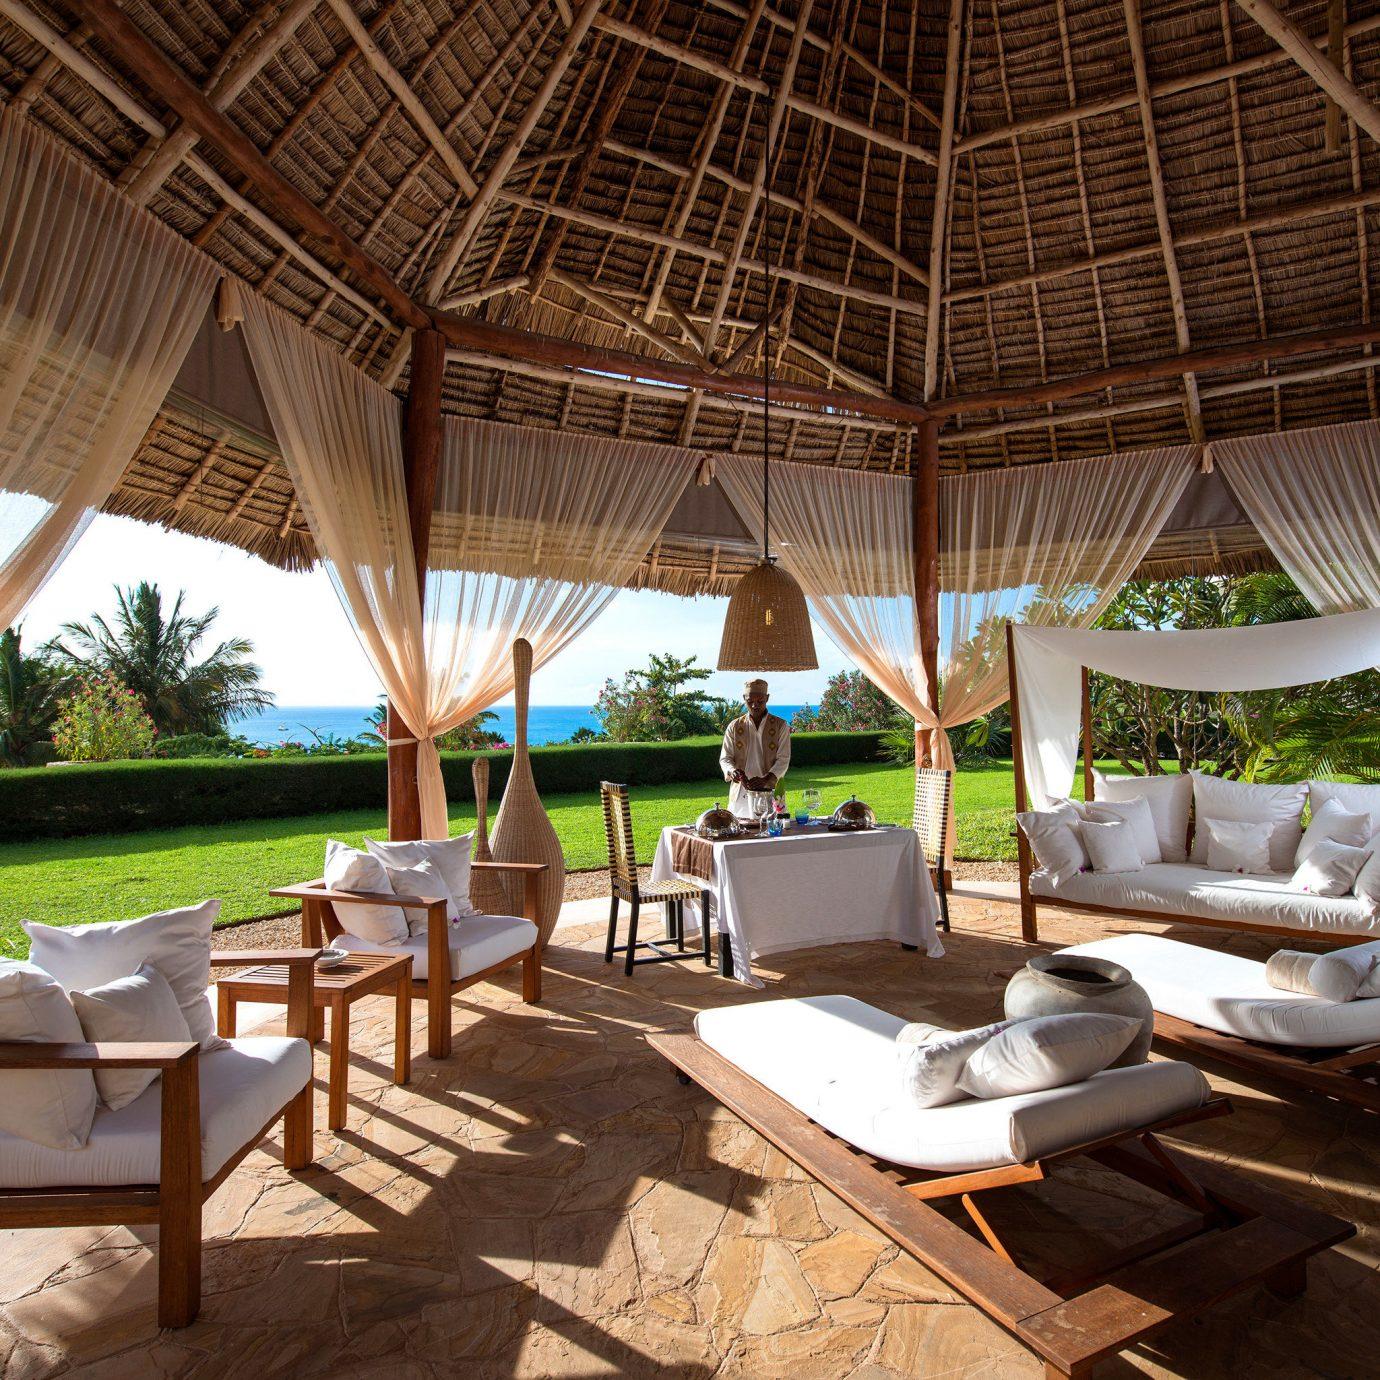 All-inclusive Beachfront Dining Luxury Resort chair home backyard restaurant Villa hacienda cottage